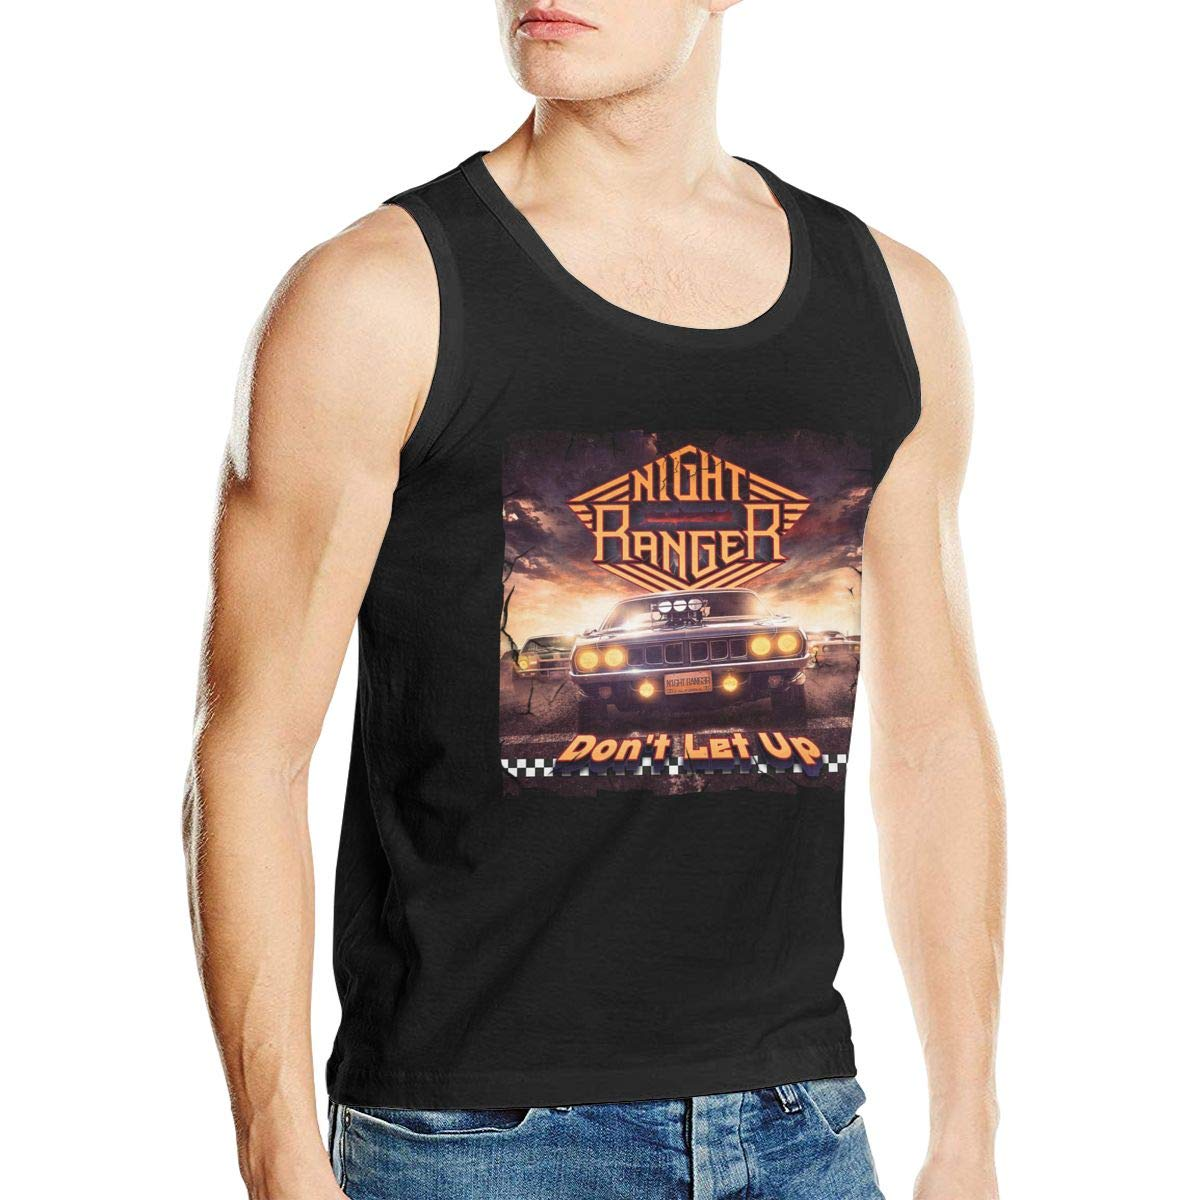 Mans Night Ranger Dont Let Up Cool Summer Cotton Music Band Fans Sleeveless Tank T-Shirt